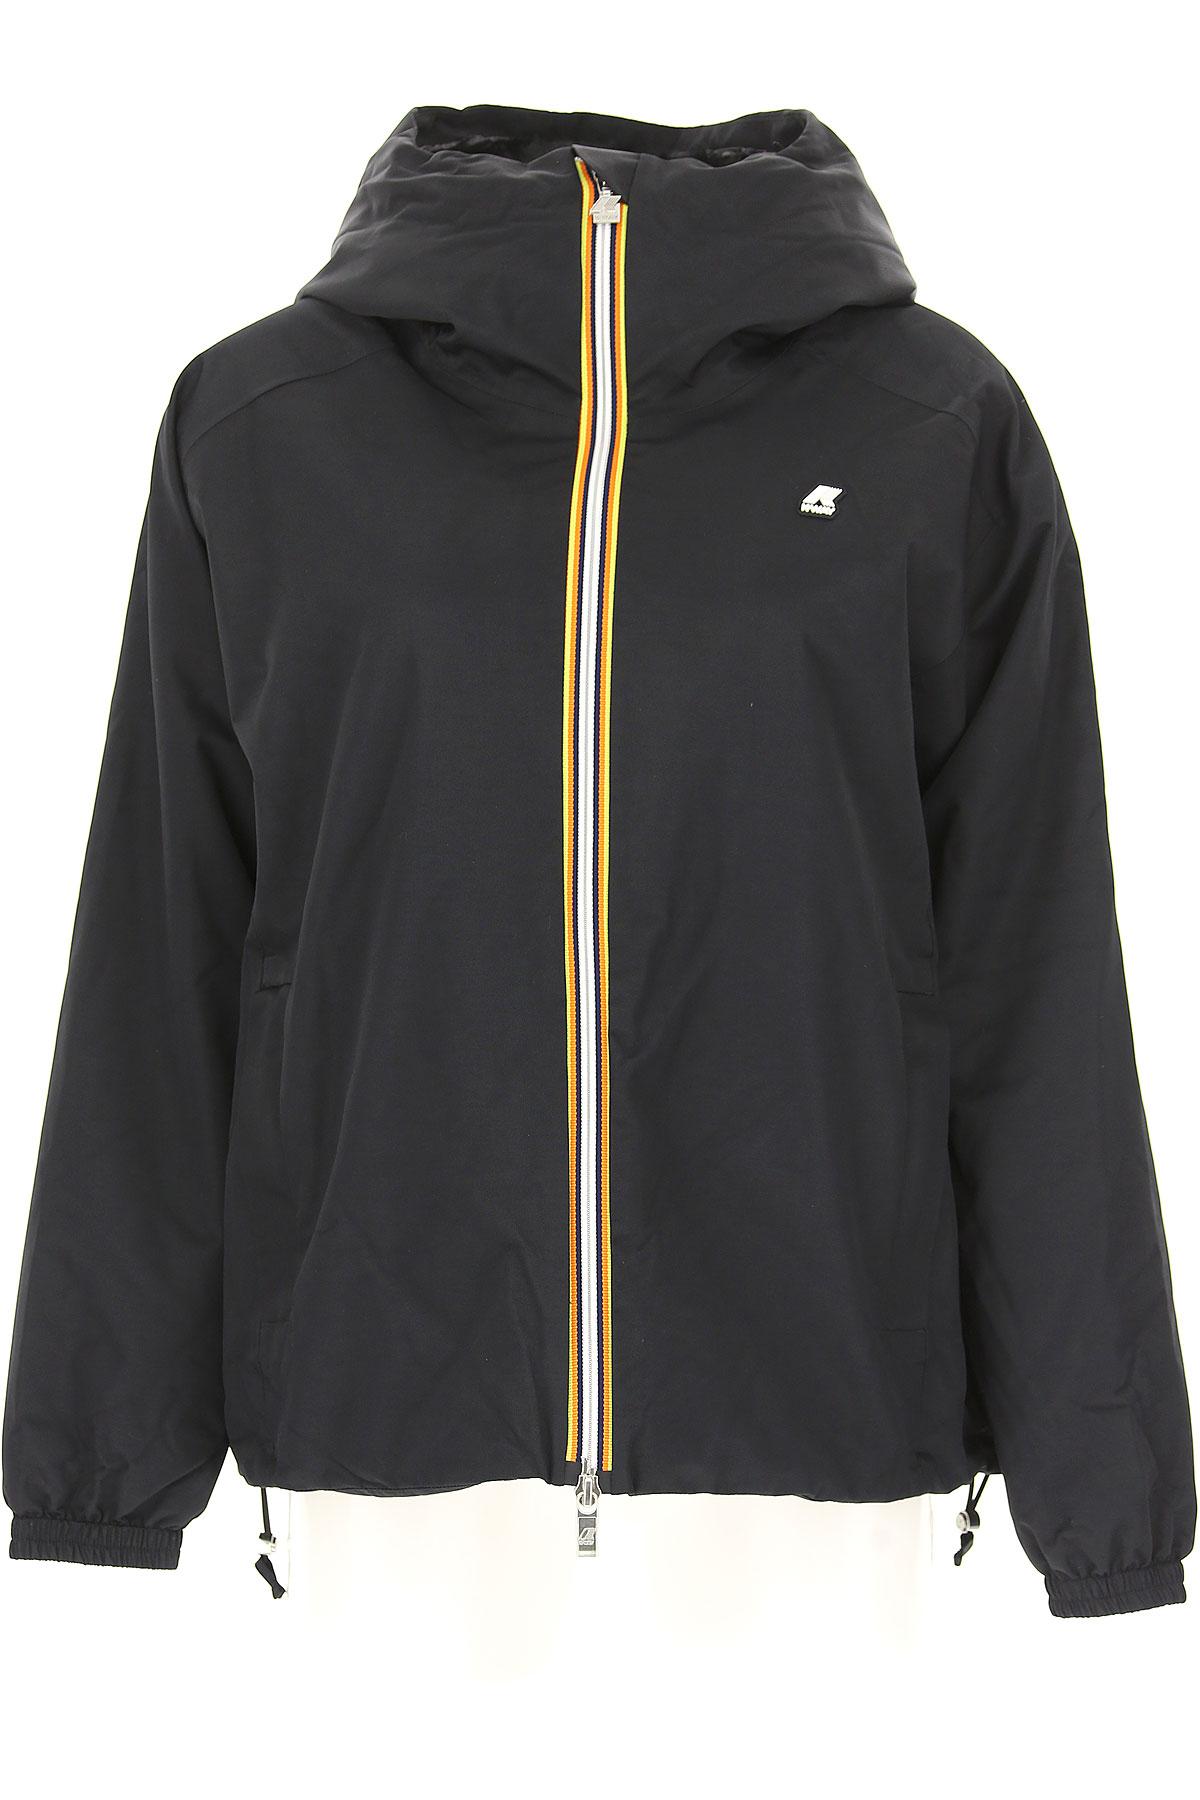 K-Way Down Jacket for Women, Puffer Ski Jacket On Sale, Black, Down, 2019, 40 44